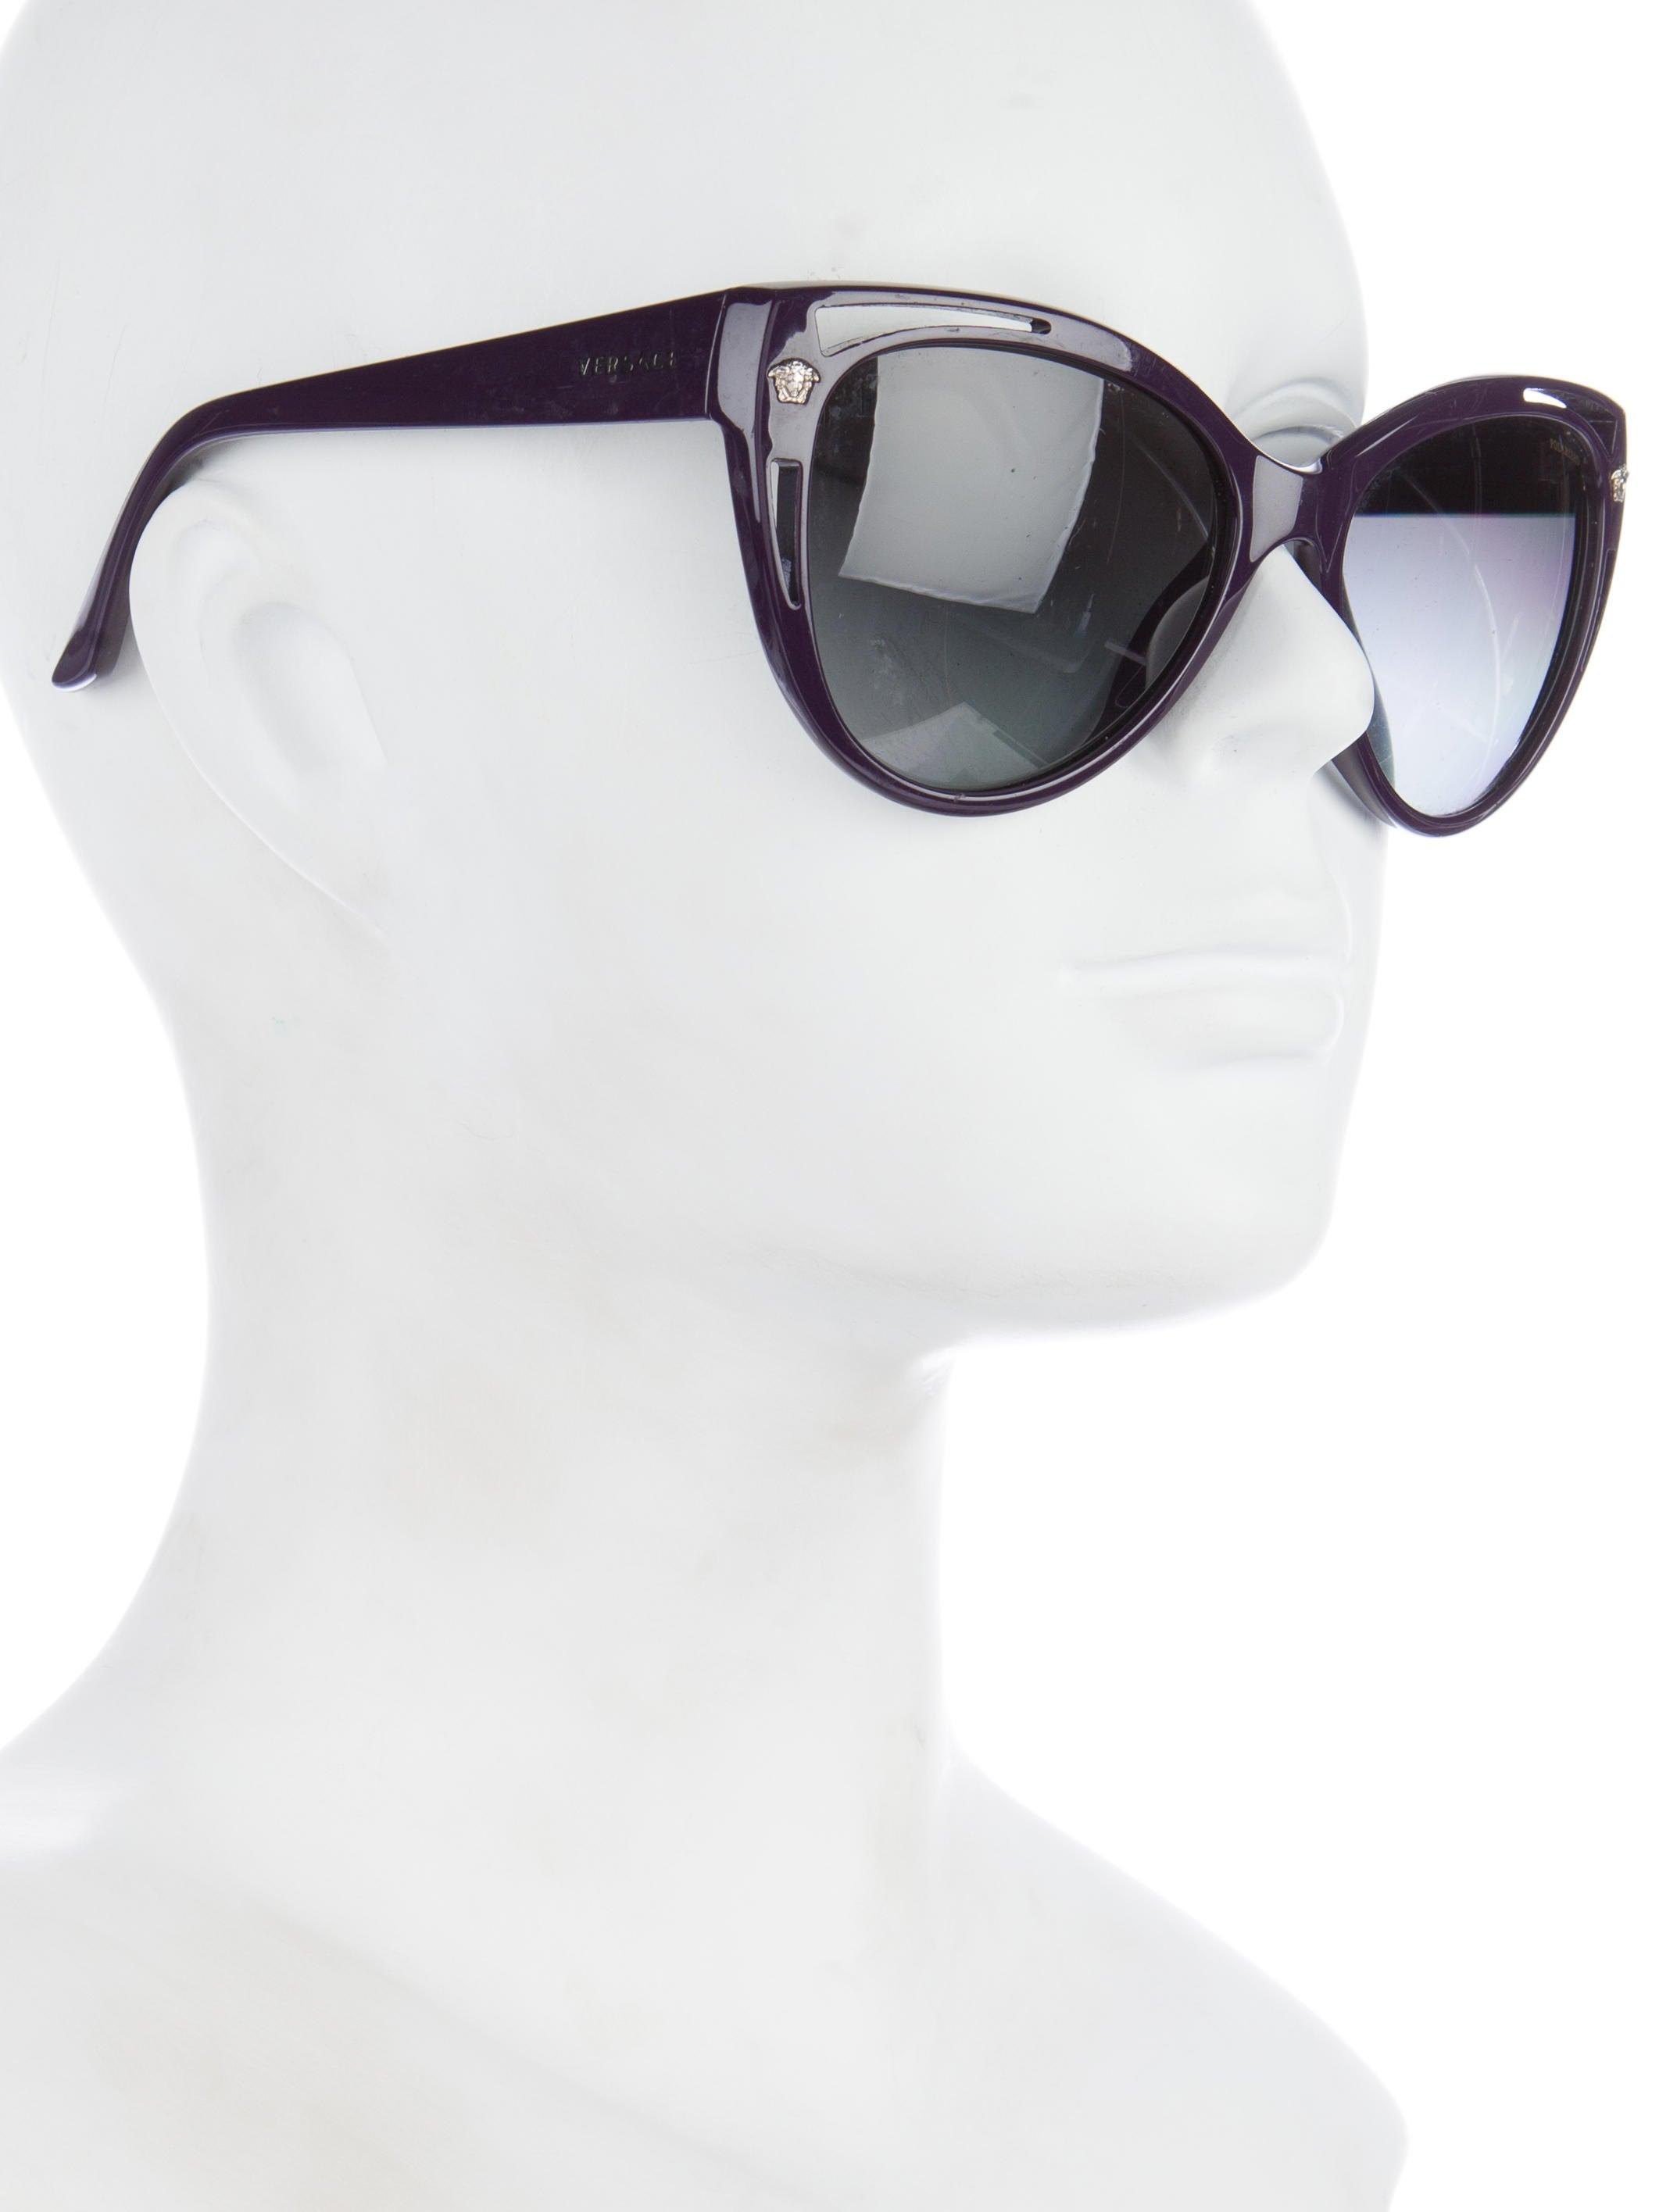 6cc5c1f486a9 Versace Cateye Shield Sunglasses. Versace Cat Eye Sunglasses 2014